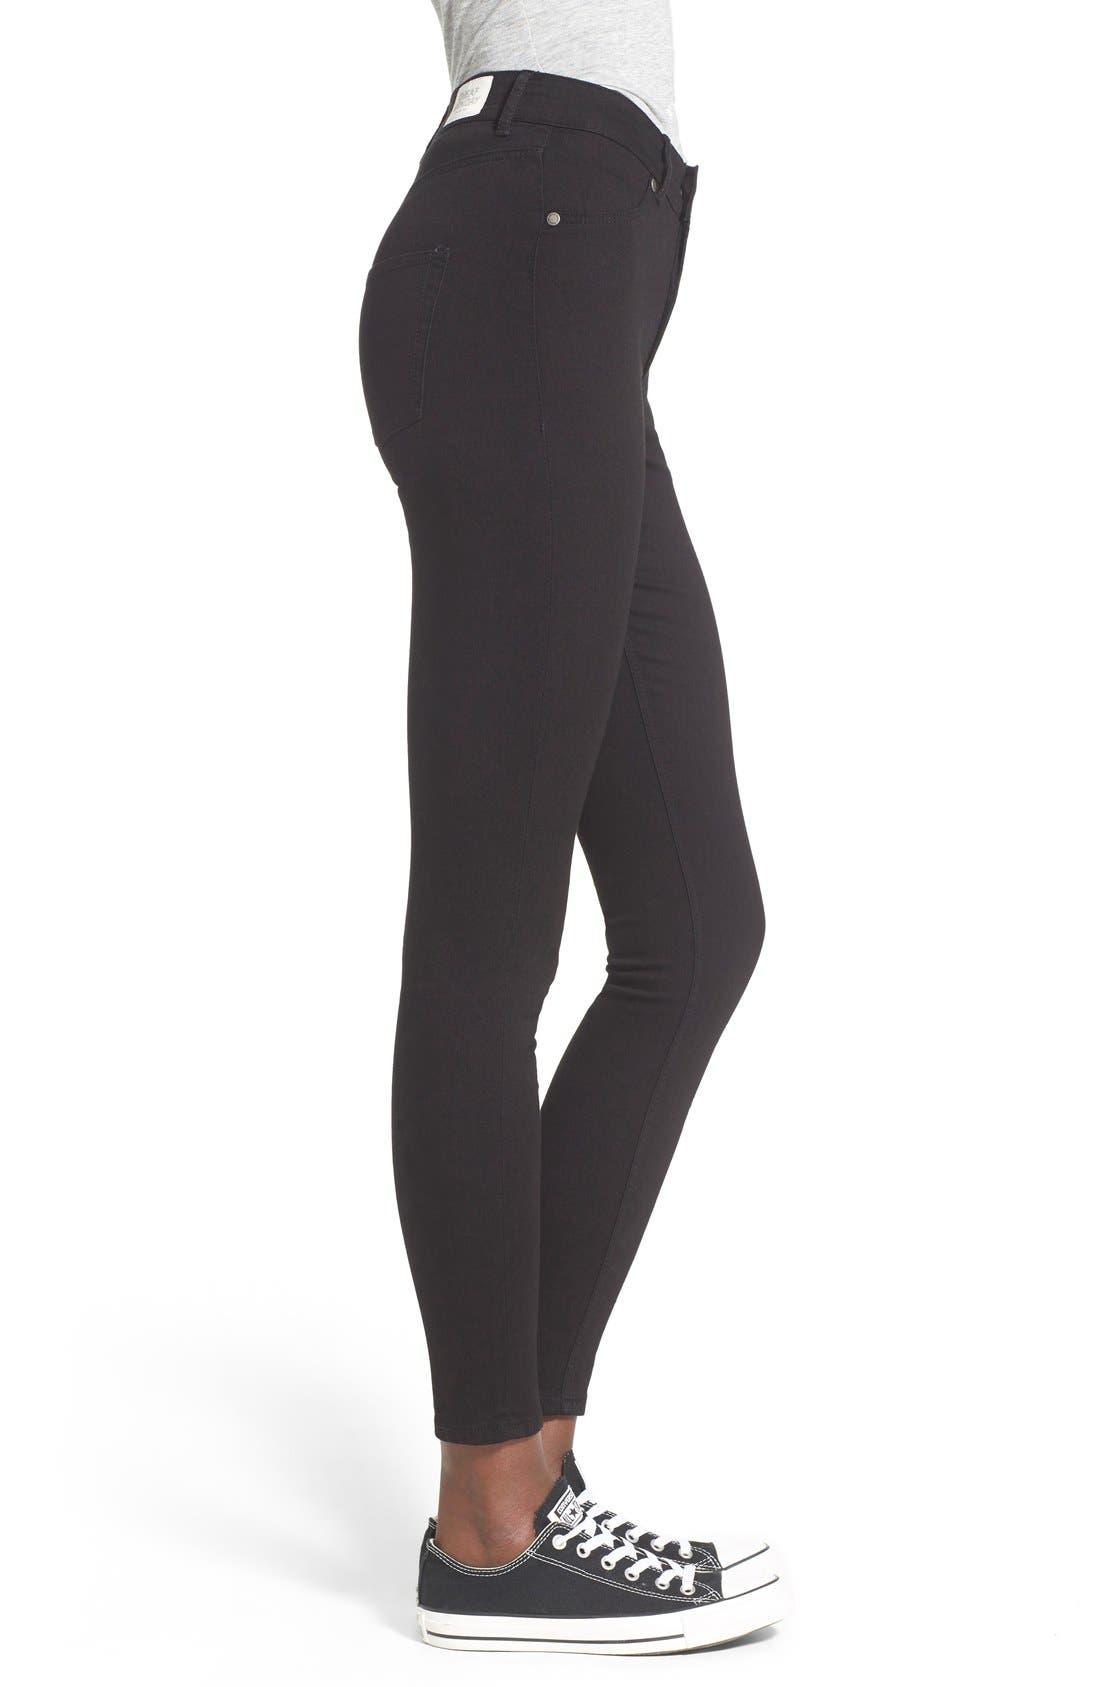 Alternate Image 3  - Cheap Monday High Rise Super Skinny Jeans (Black)